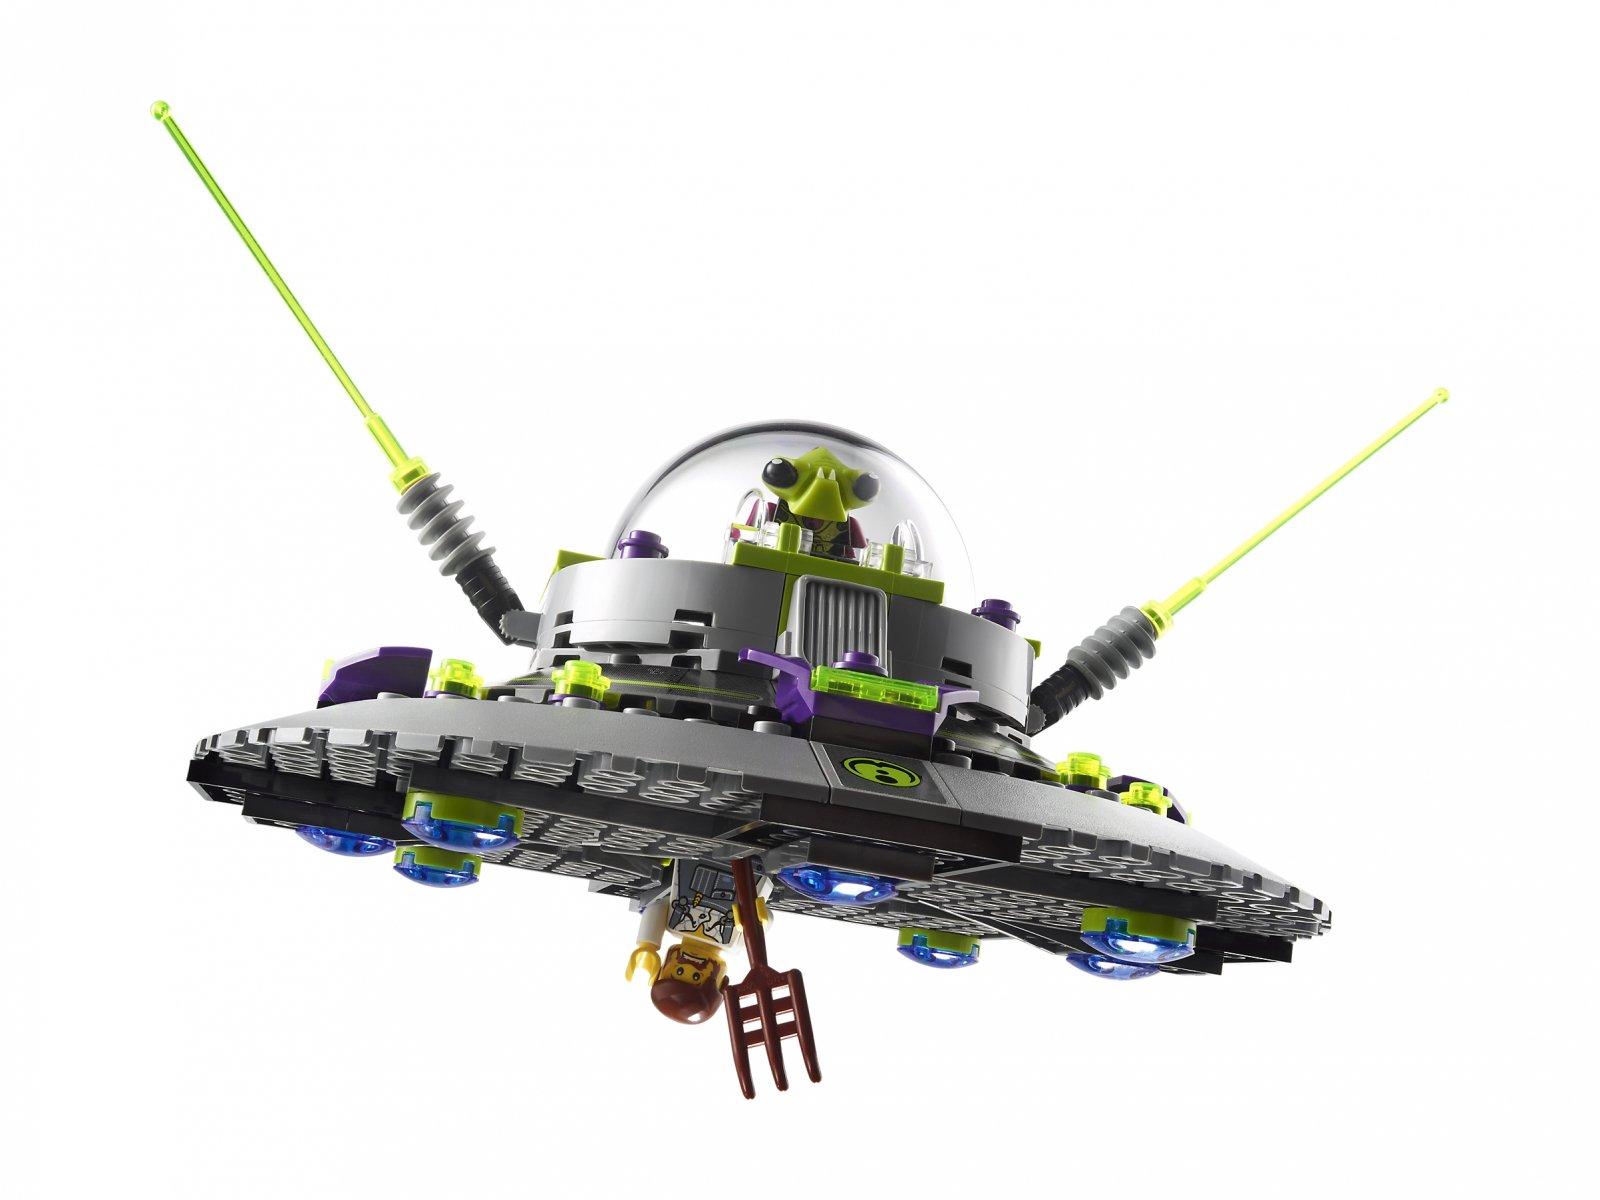 LEGO 7052 UFO Abduction